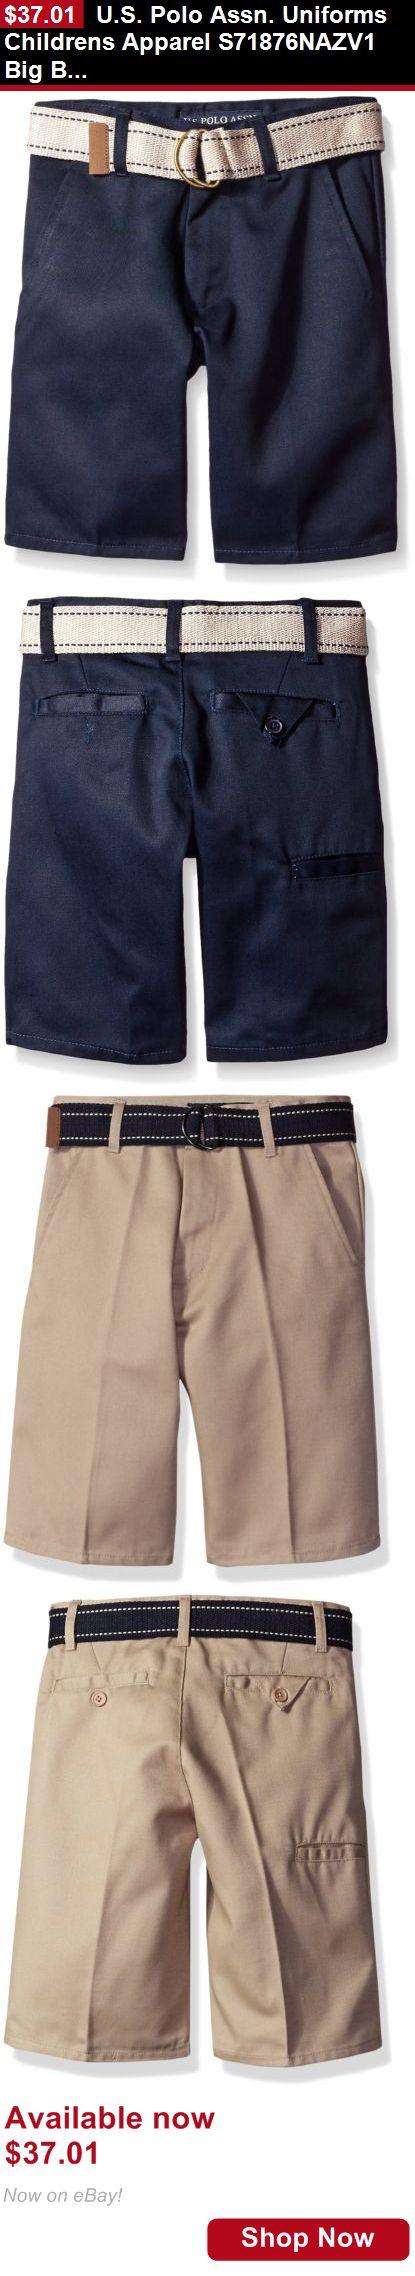 Boys uniforms: U.S. Polo Assn. Uniforms Childrens Apparel S71876nazv1 Big Boys BUY IT NOW ONLY: $37.01